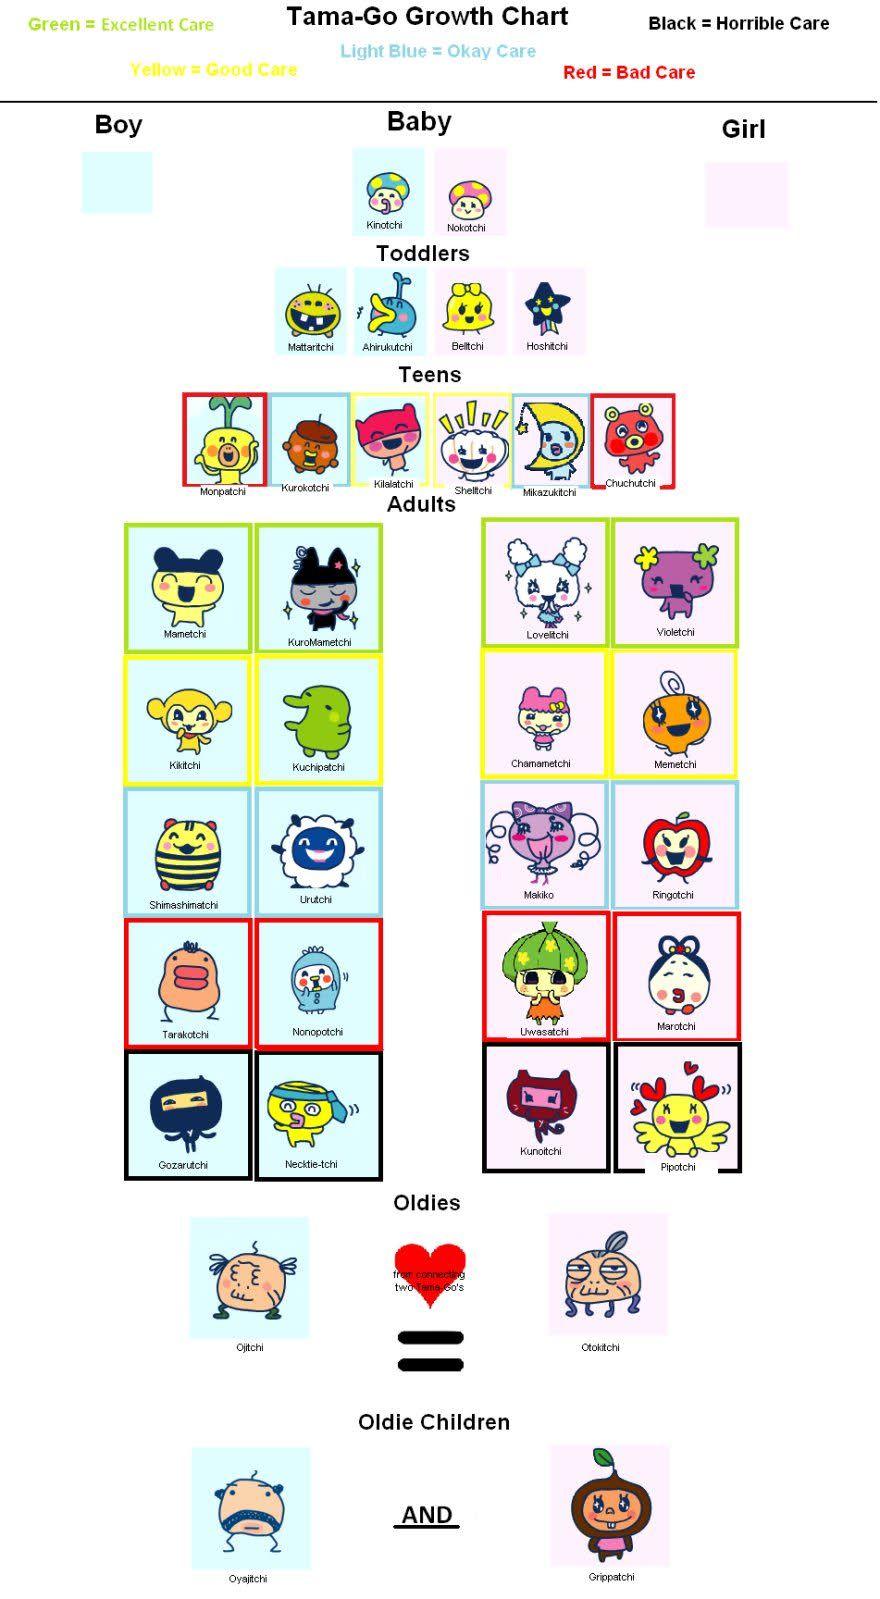 Tamago Growth Chart I Just Love Tamagotchi Character Design Sooo